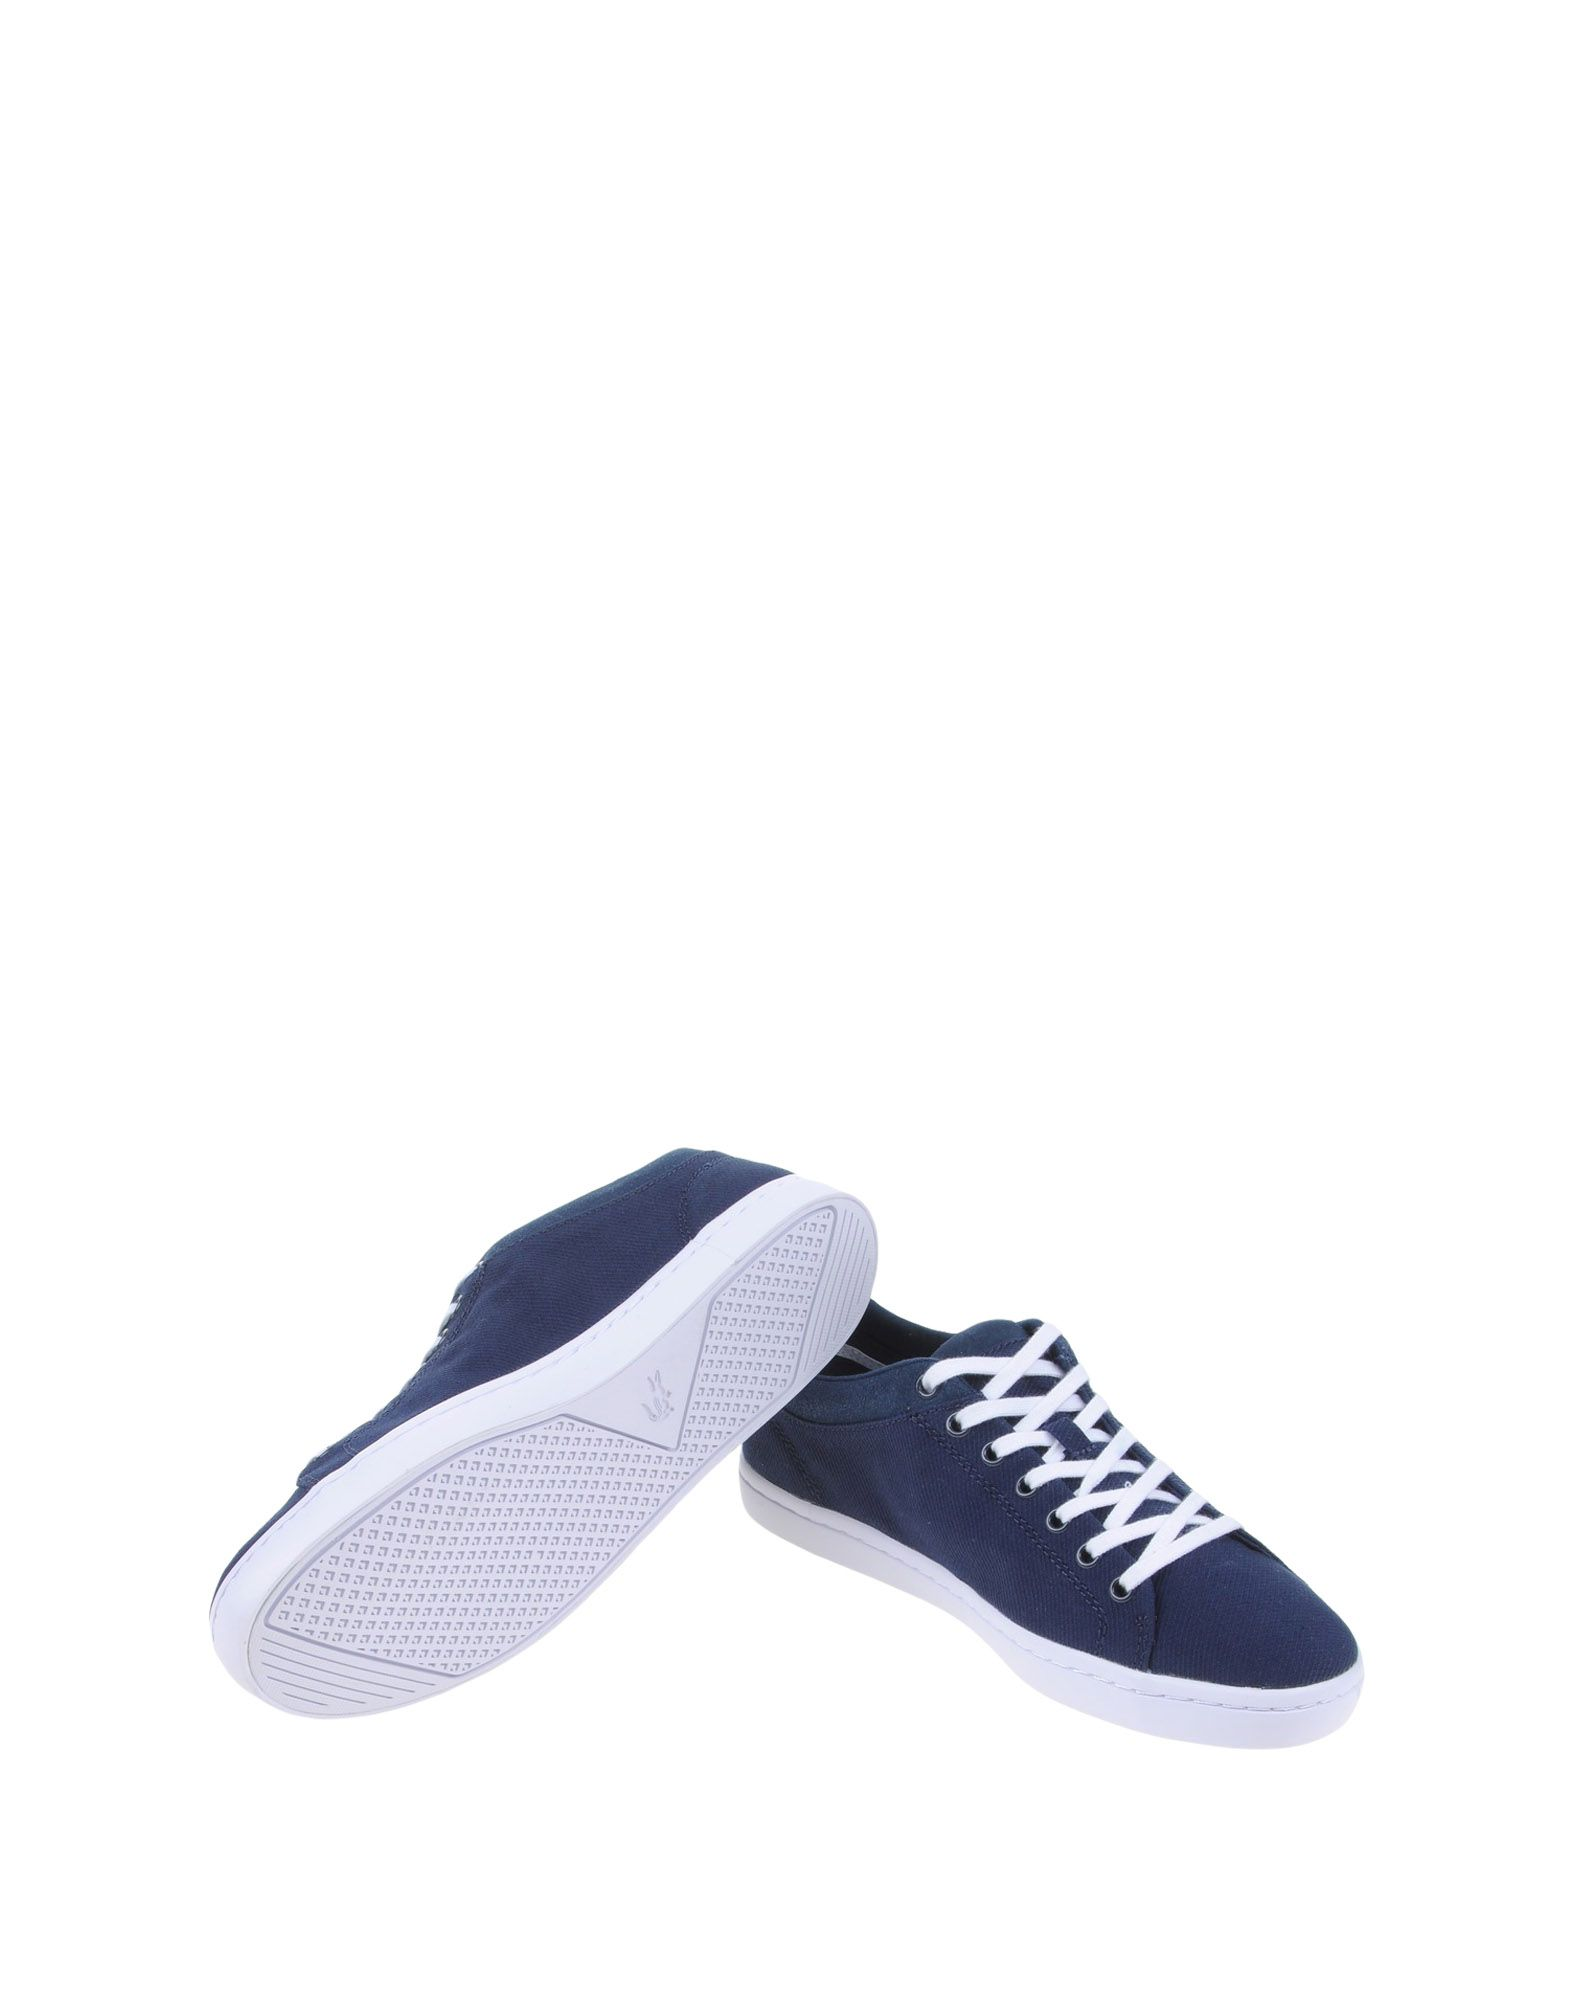 Sneakers Lacoste Straightset 116 2 - Femme - Sneakers Lacoste sur